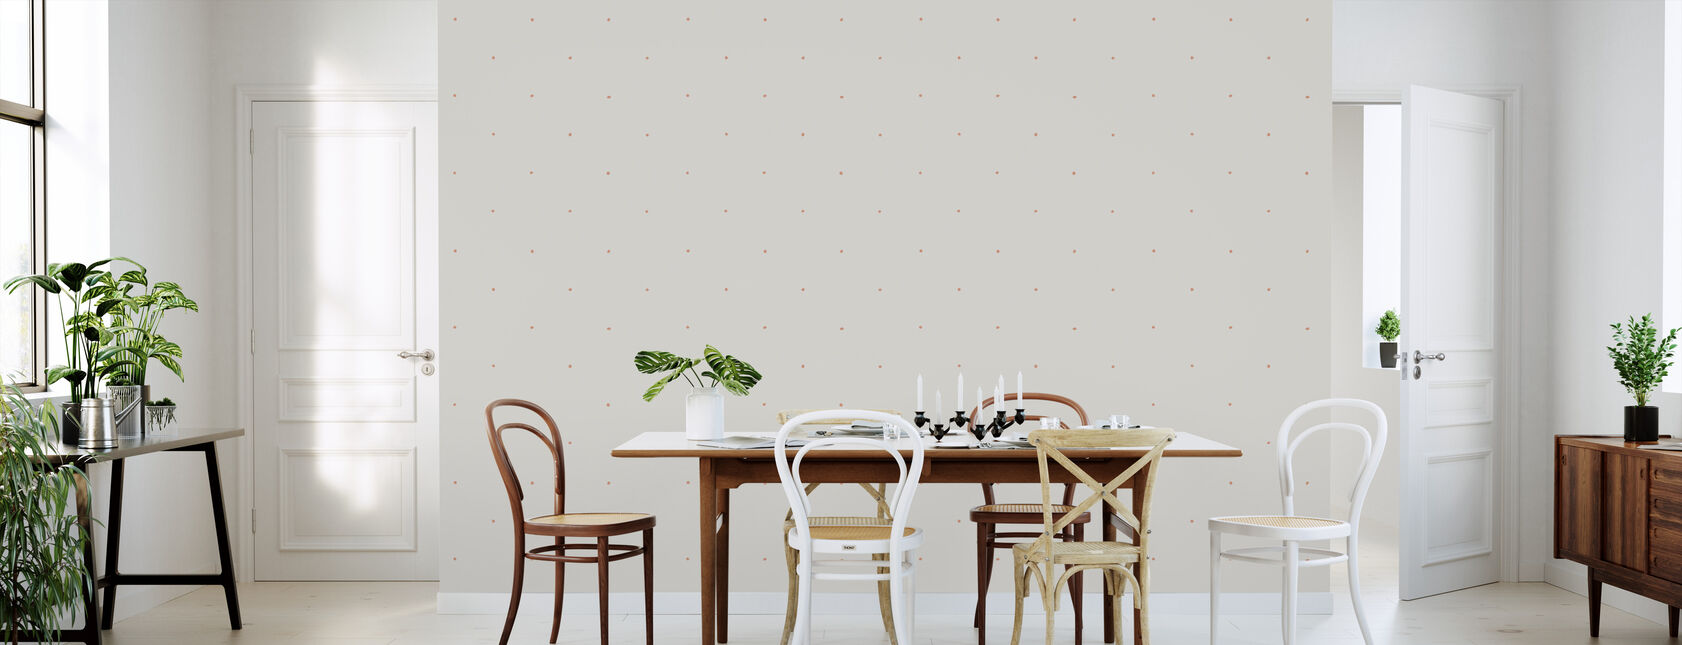 Berries Rose - Wallpaper - Kitchen